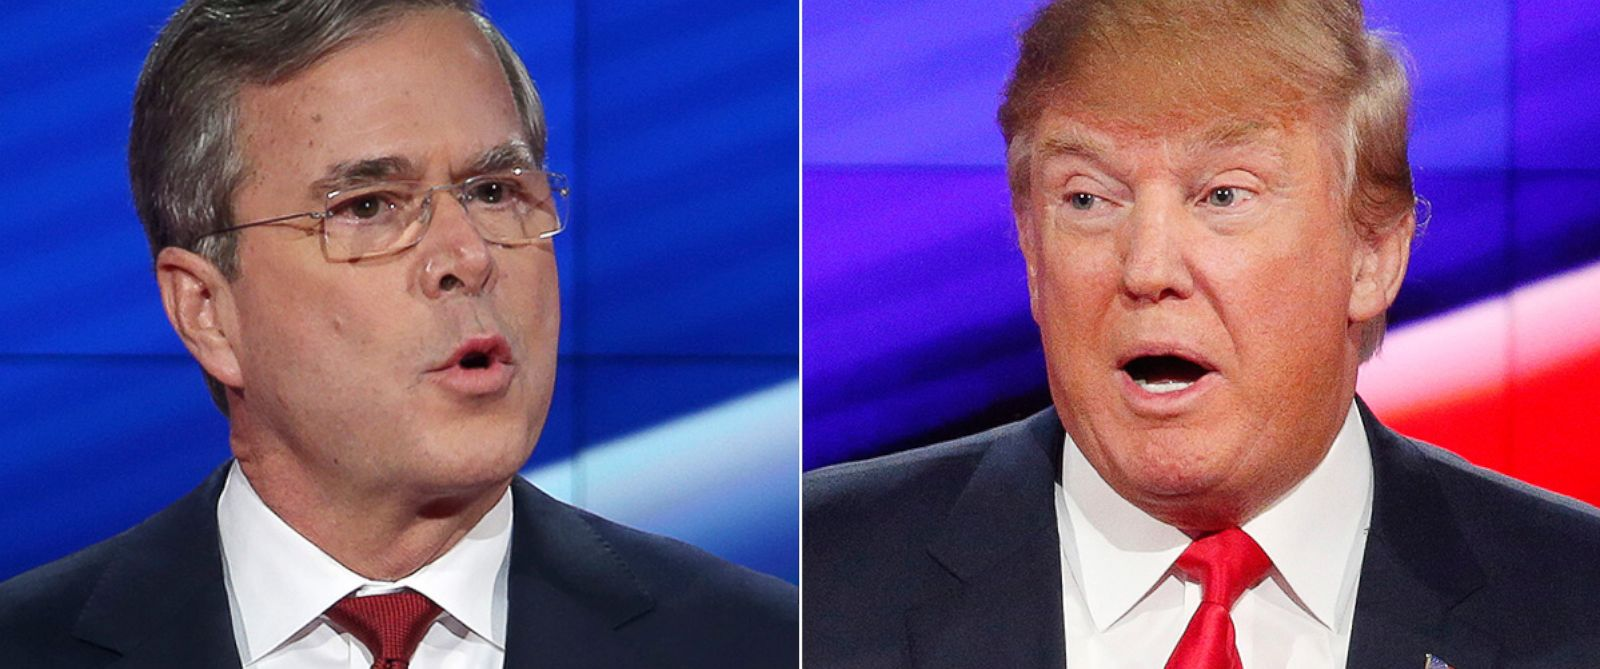 PHOTO: Jeb Bush and Donald Trump spar at the CNN Republican presidential debate at the Venetian Hotel & Casino, Dec. 15, 2015, in Las Vegas.